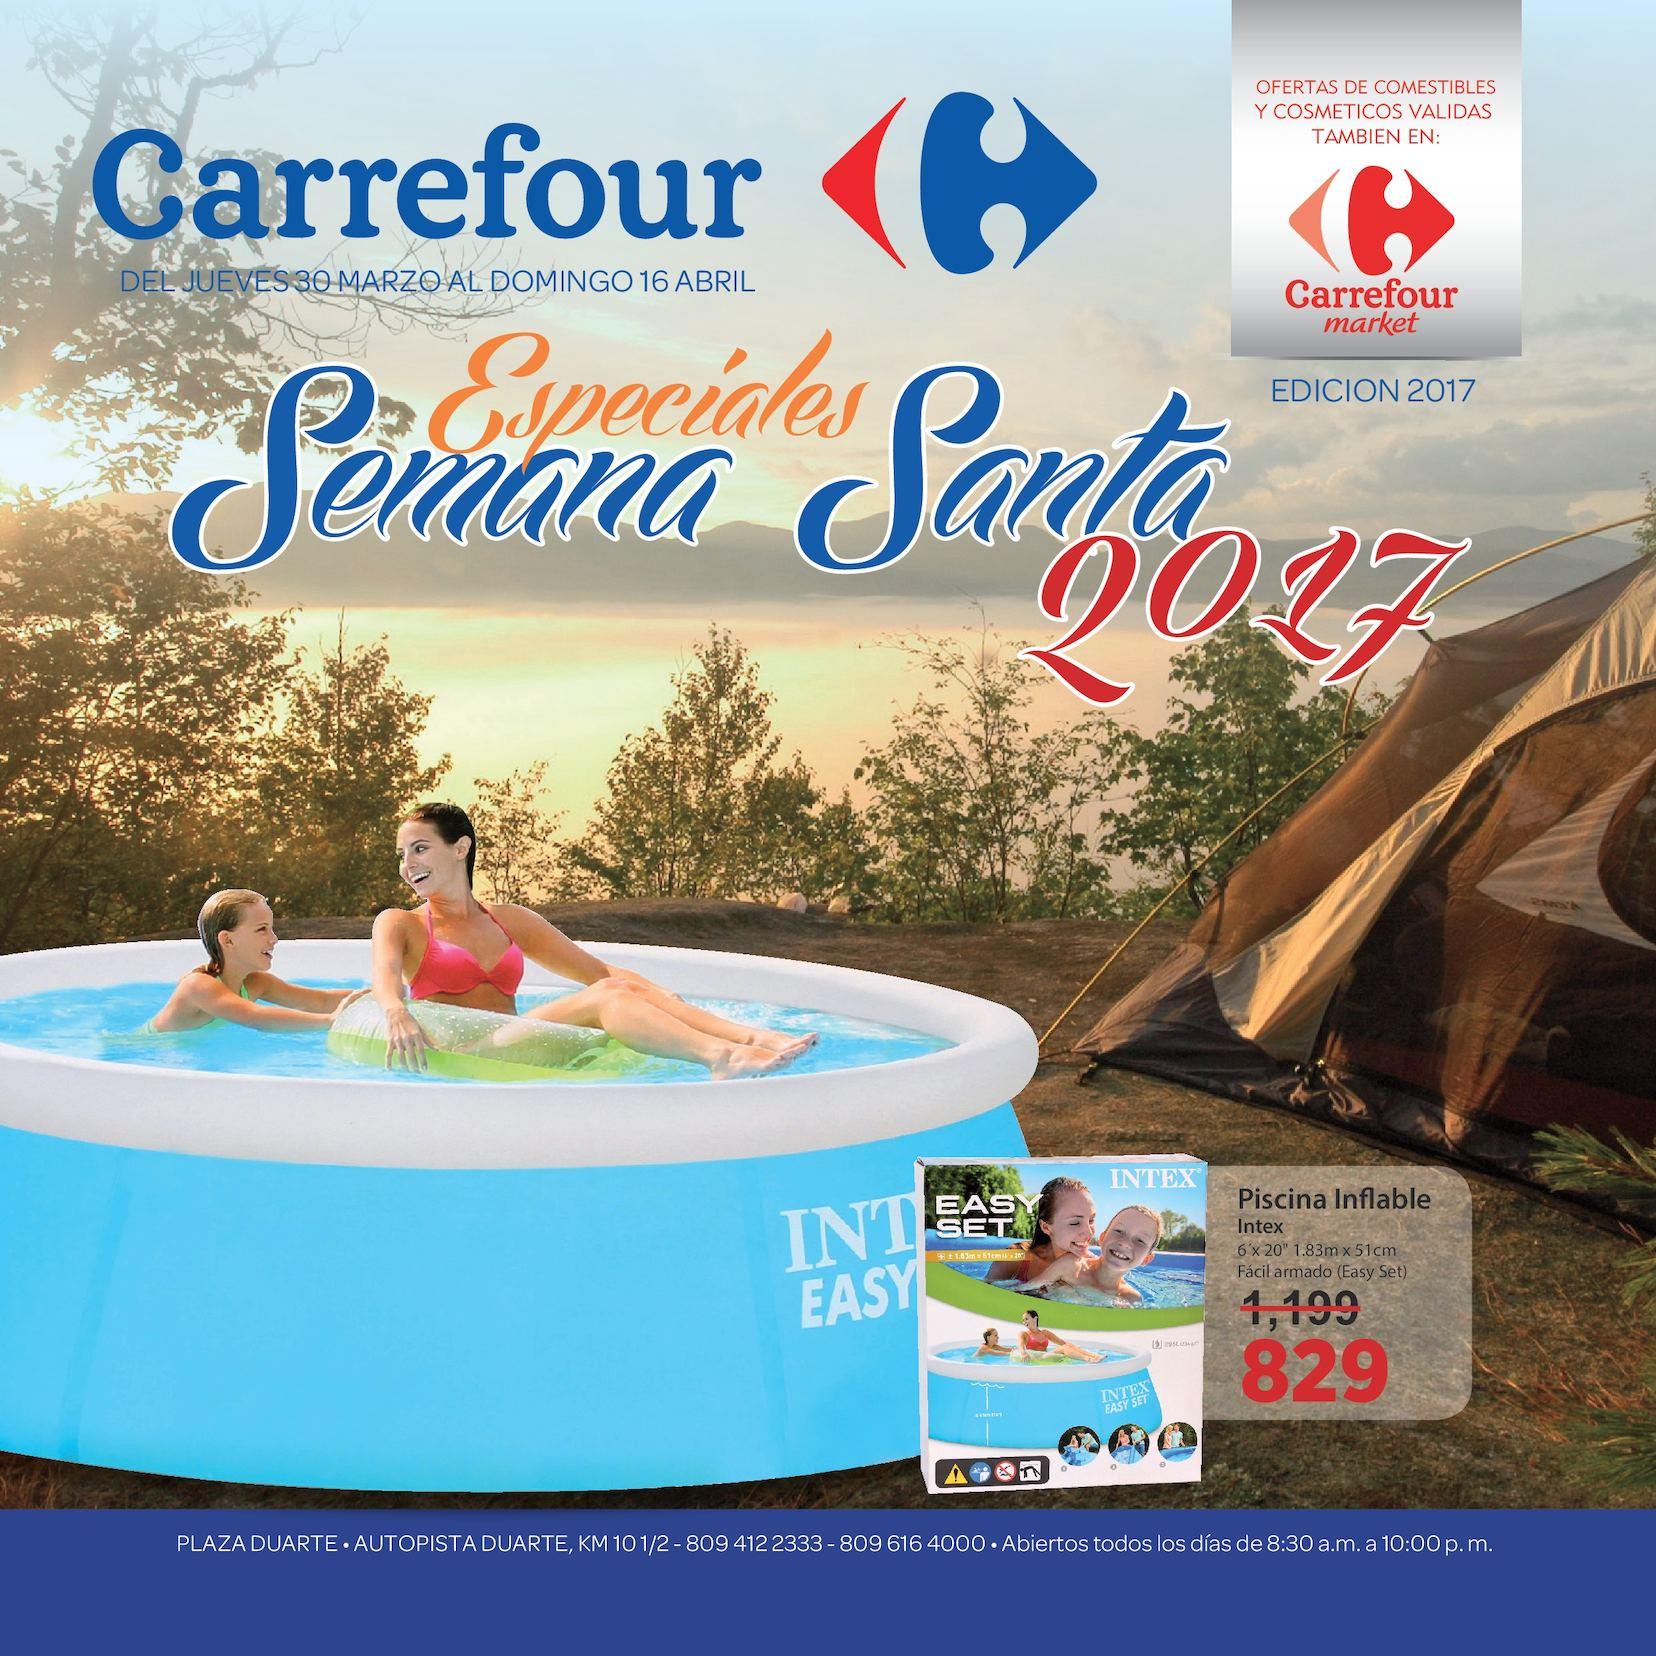 Santa Calaméo Carrefour 2017 Especiales Semana wPX8OnkN0